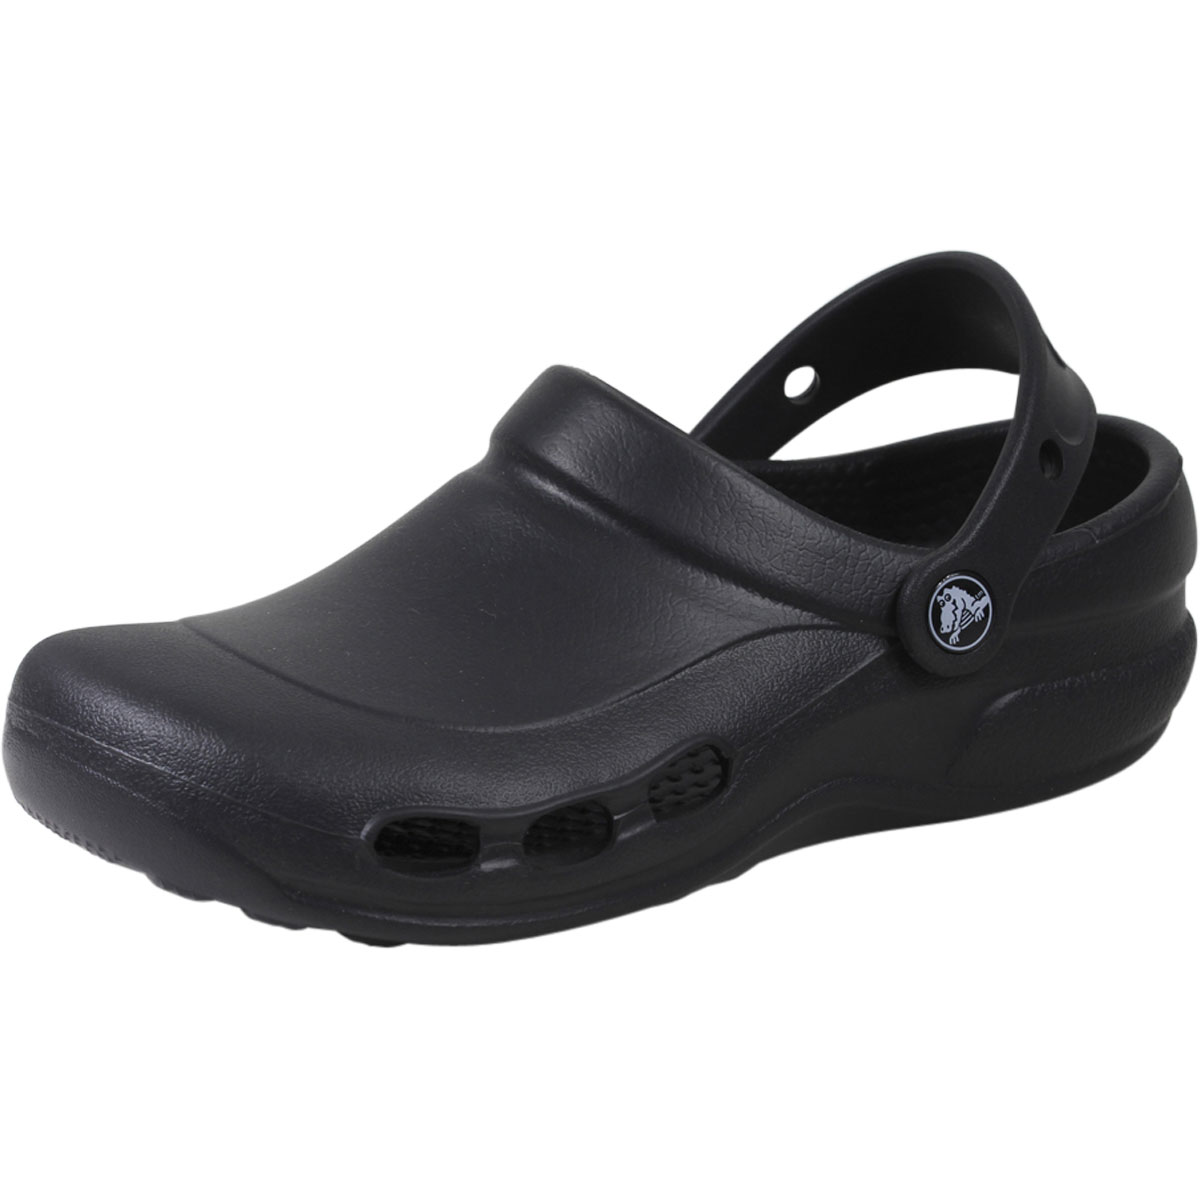 991a87aa22dd41 Crocs Specialist Vent Unisex Mens Womens Comfort Croslite Work Clogs ...